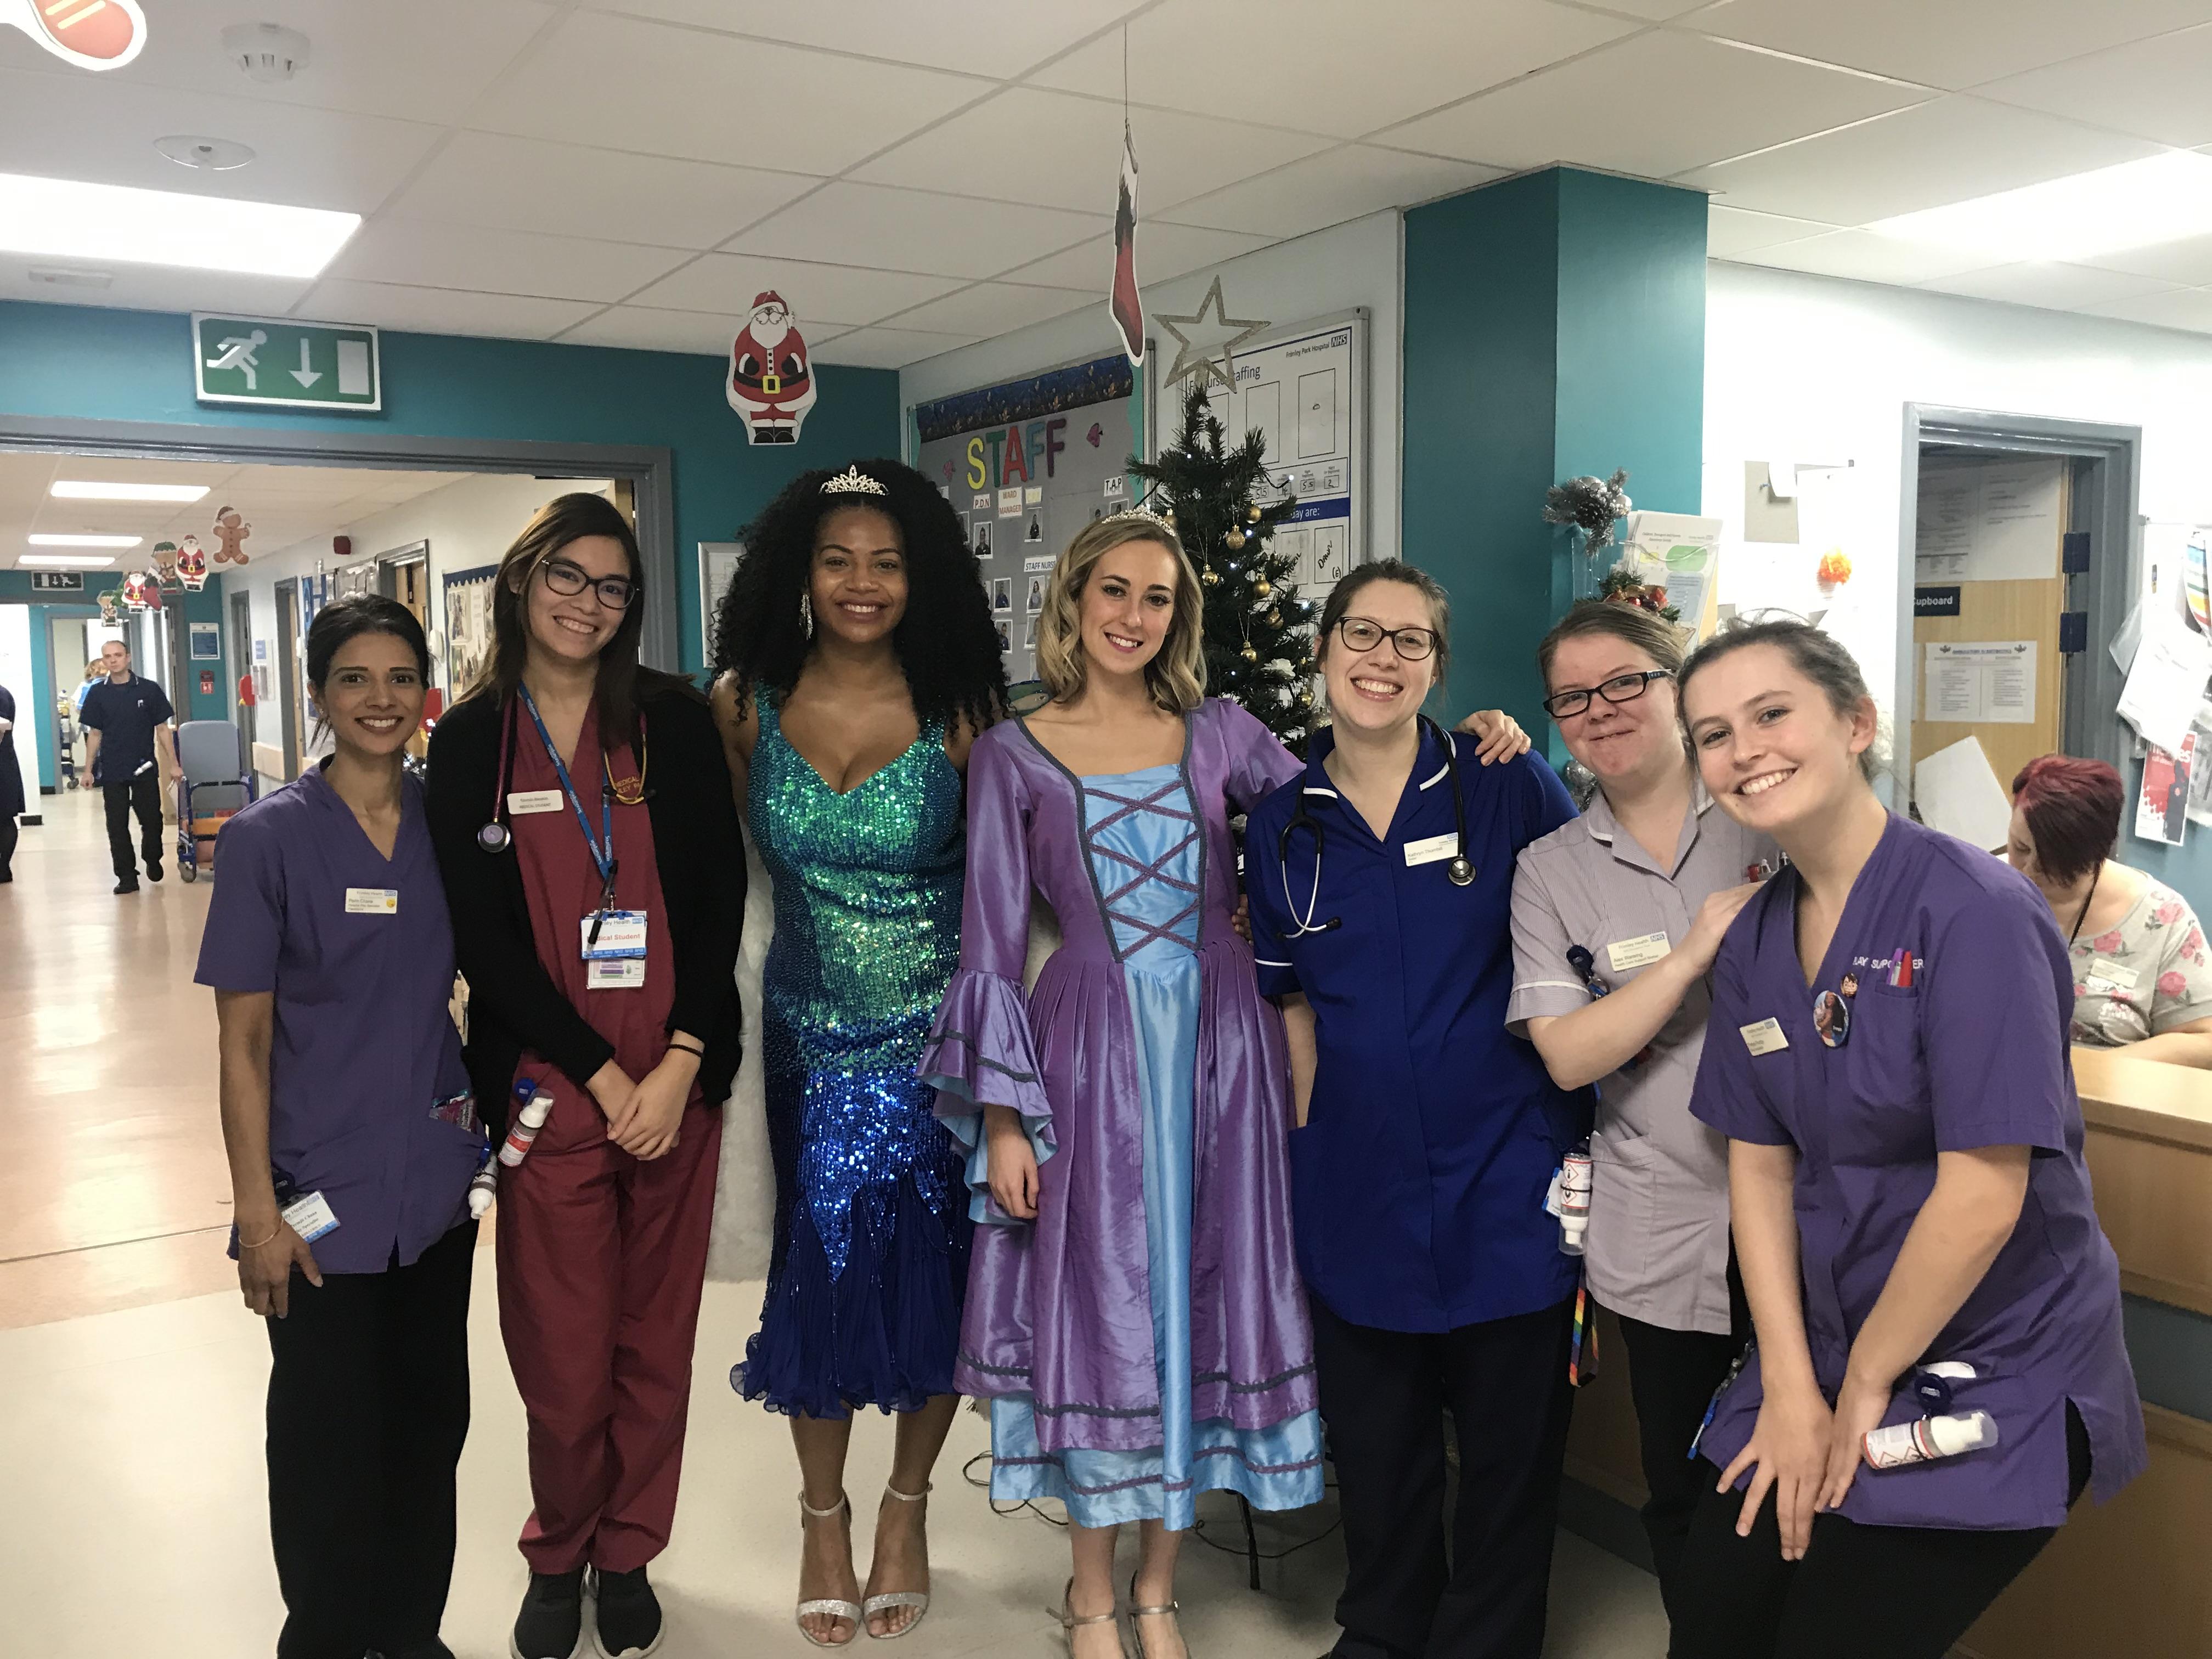 Cast of Sleeping Beauty Visit Children's Ward | Camberley Net